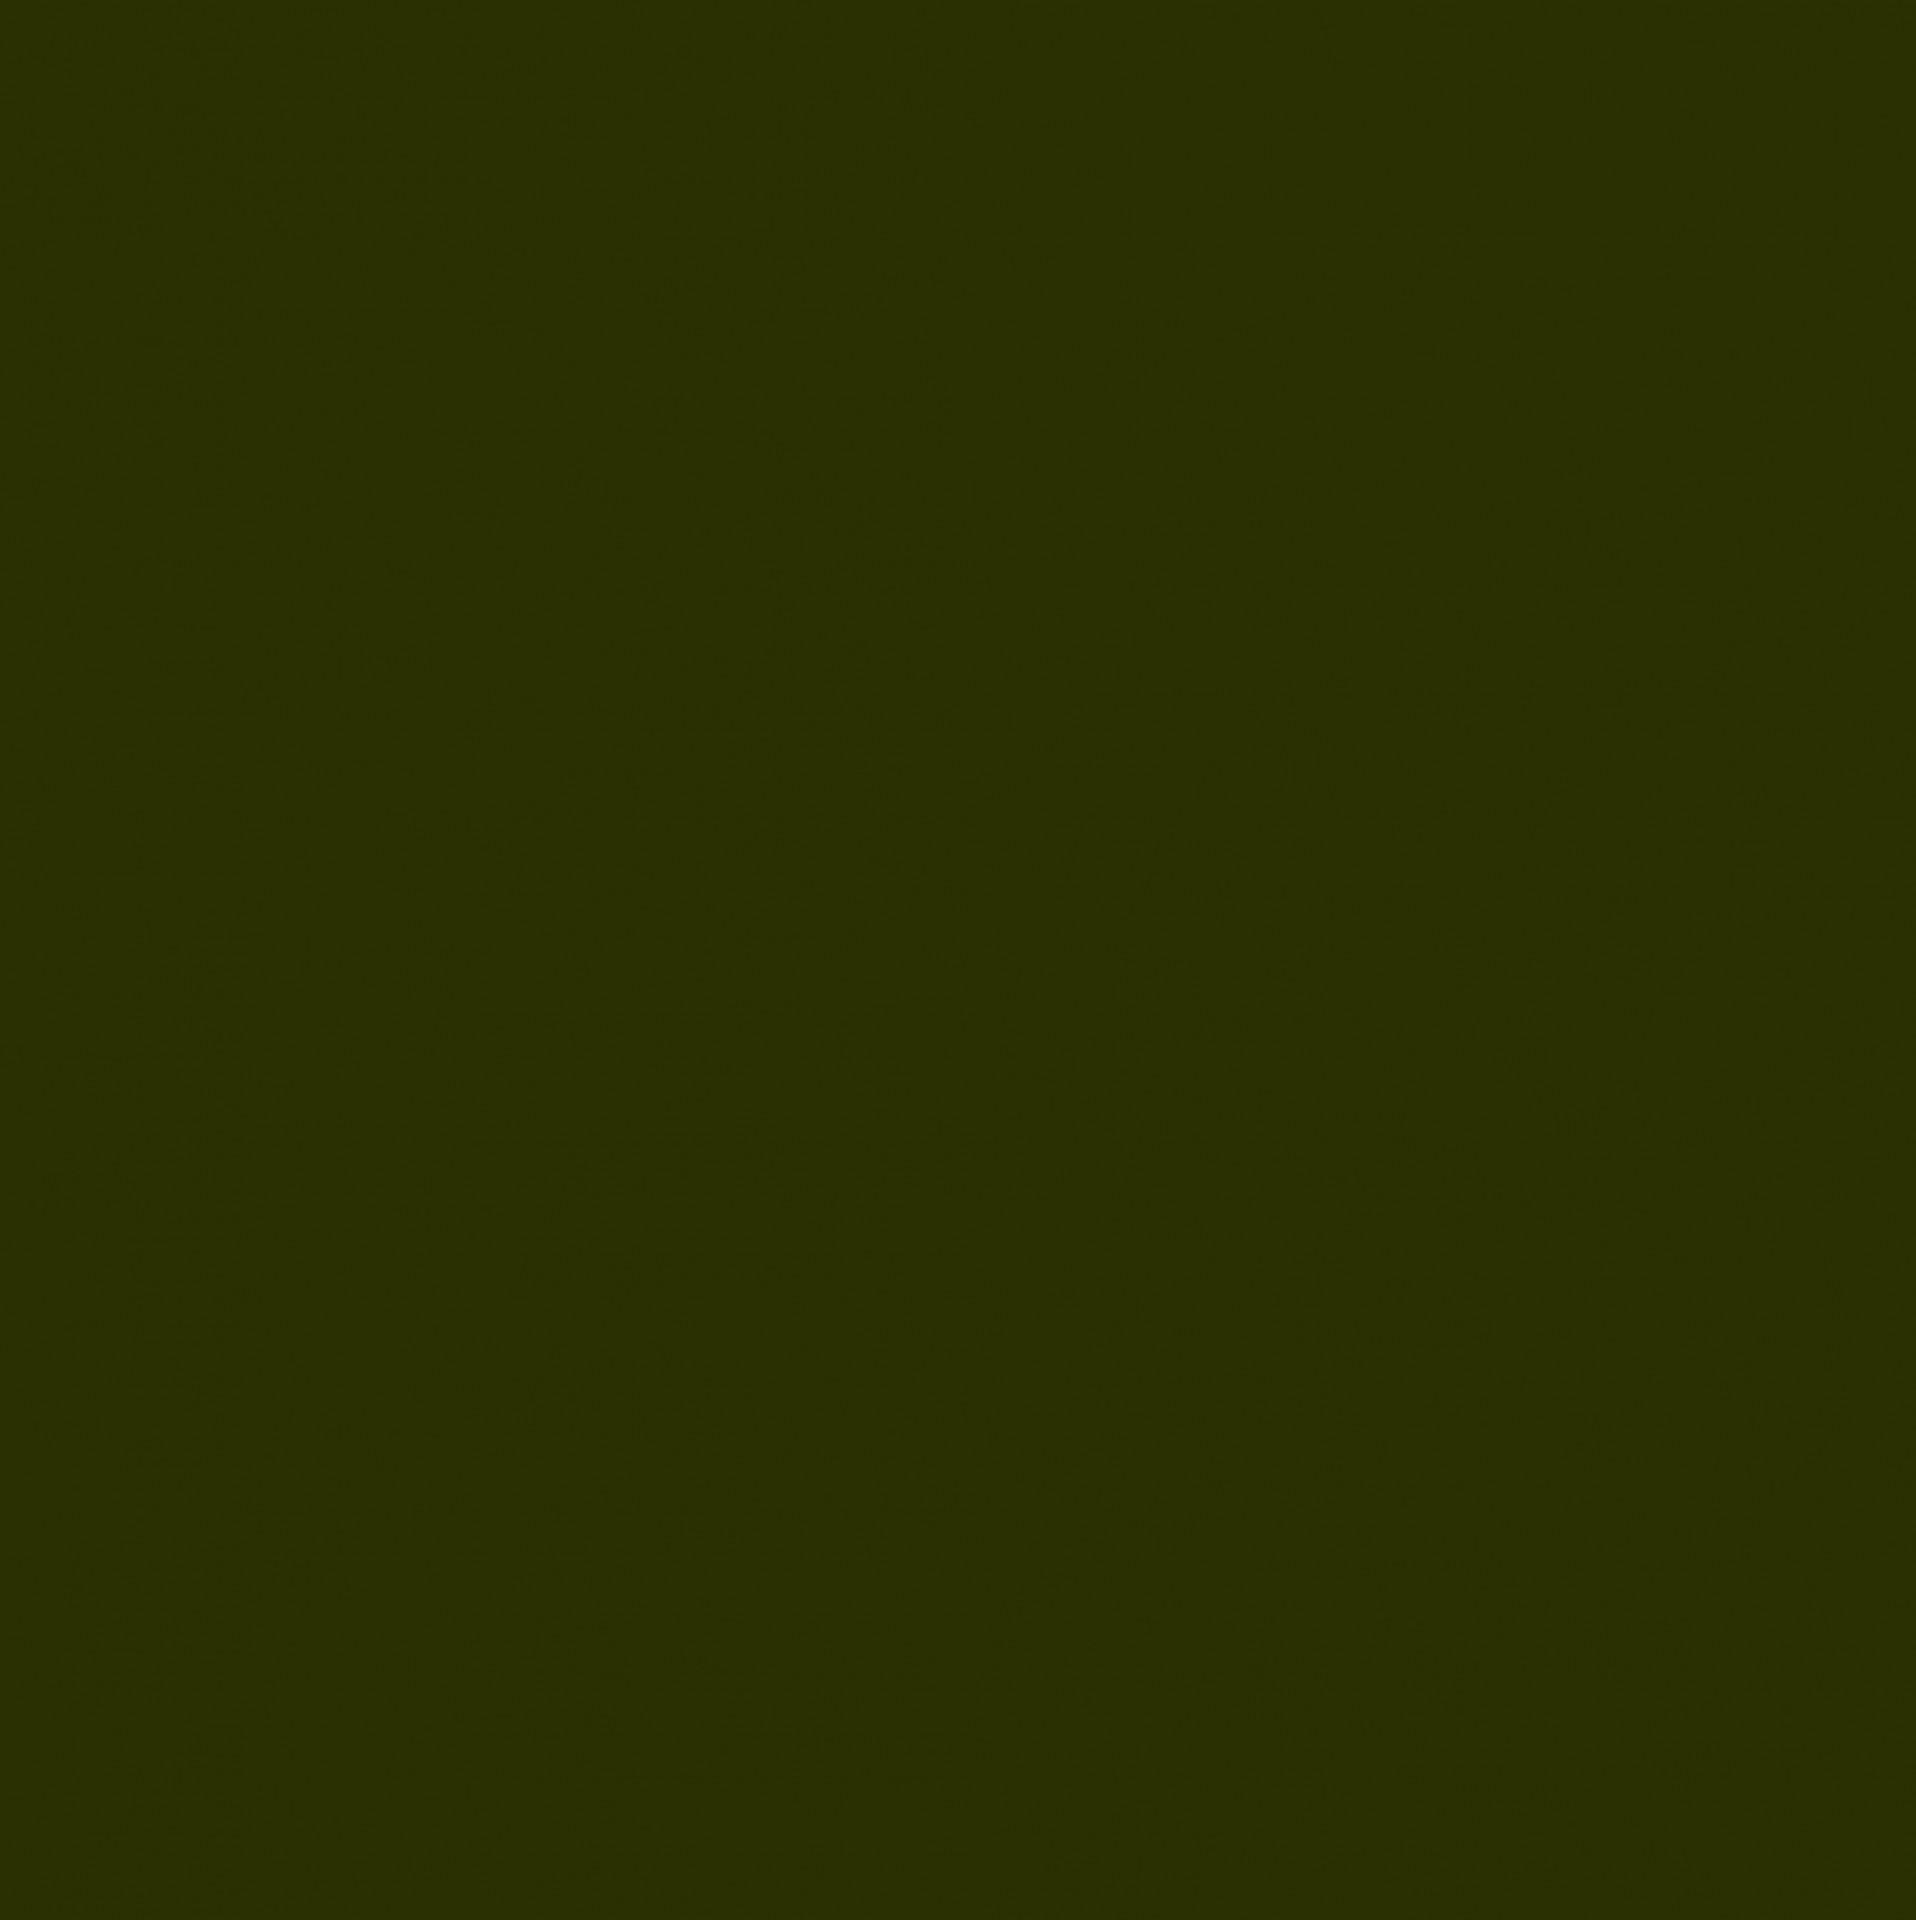 Green Desktop Wallpaper: Dark Green Background ·① Download Free High Resolution